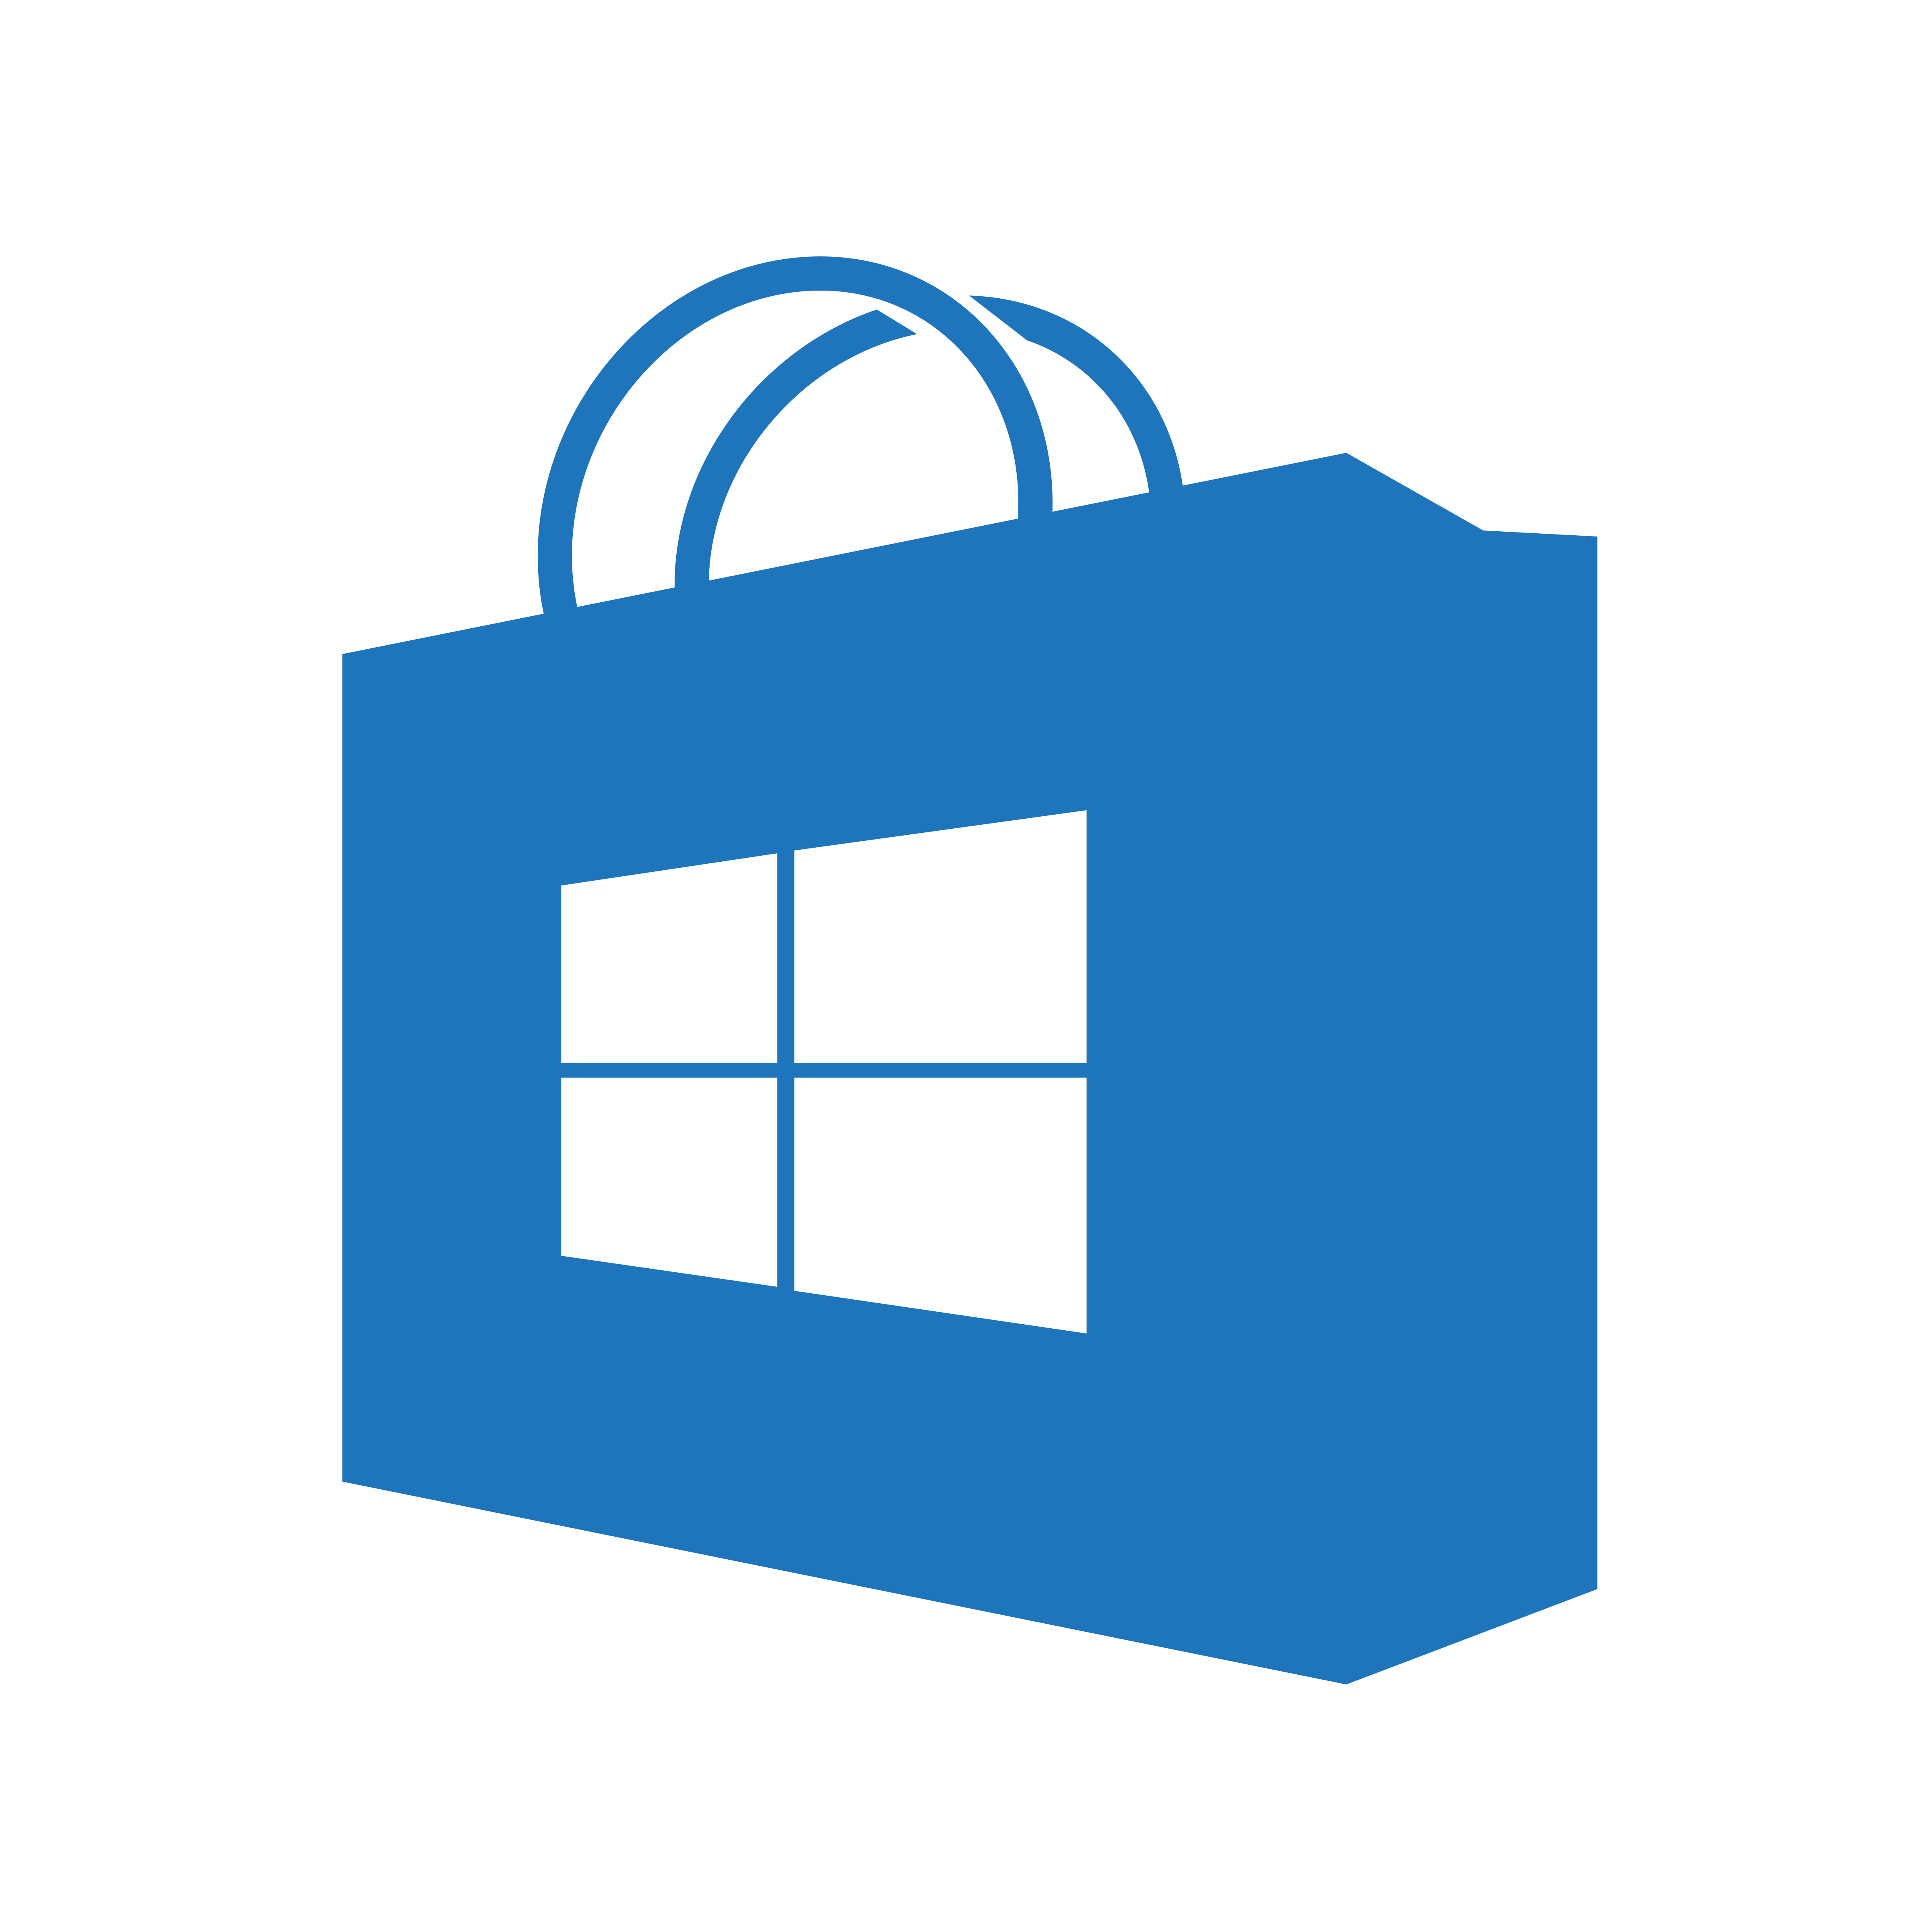 Windows Store icon (transparent/blue) (homemade) by bannax1994 on DeviantArt